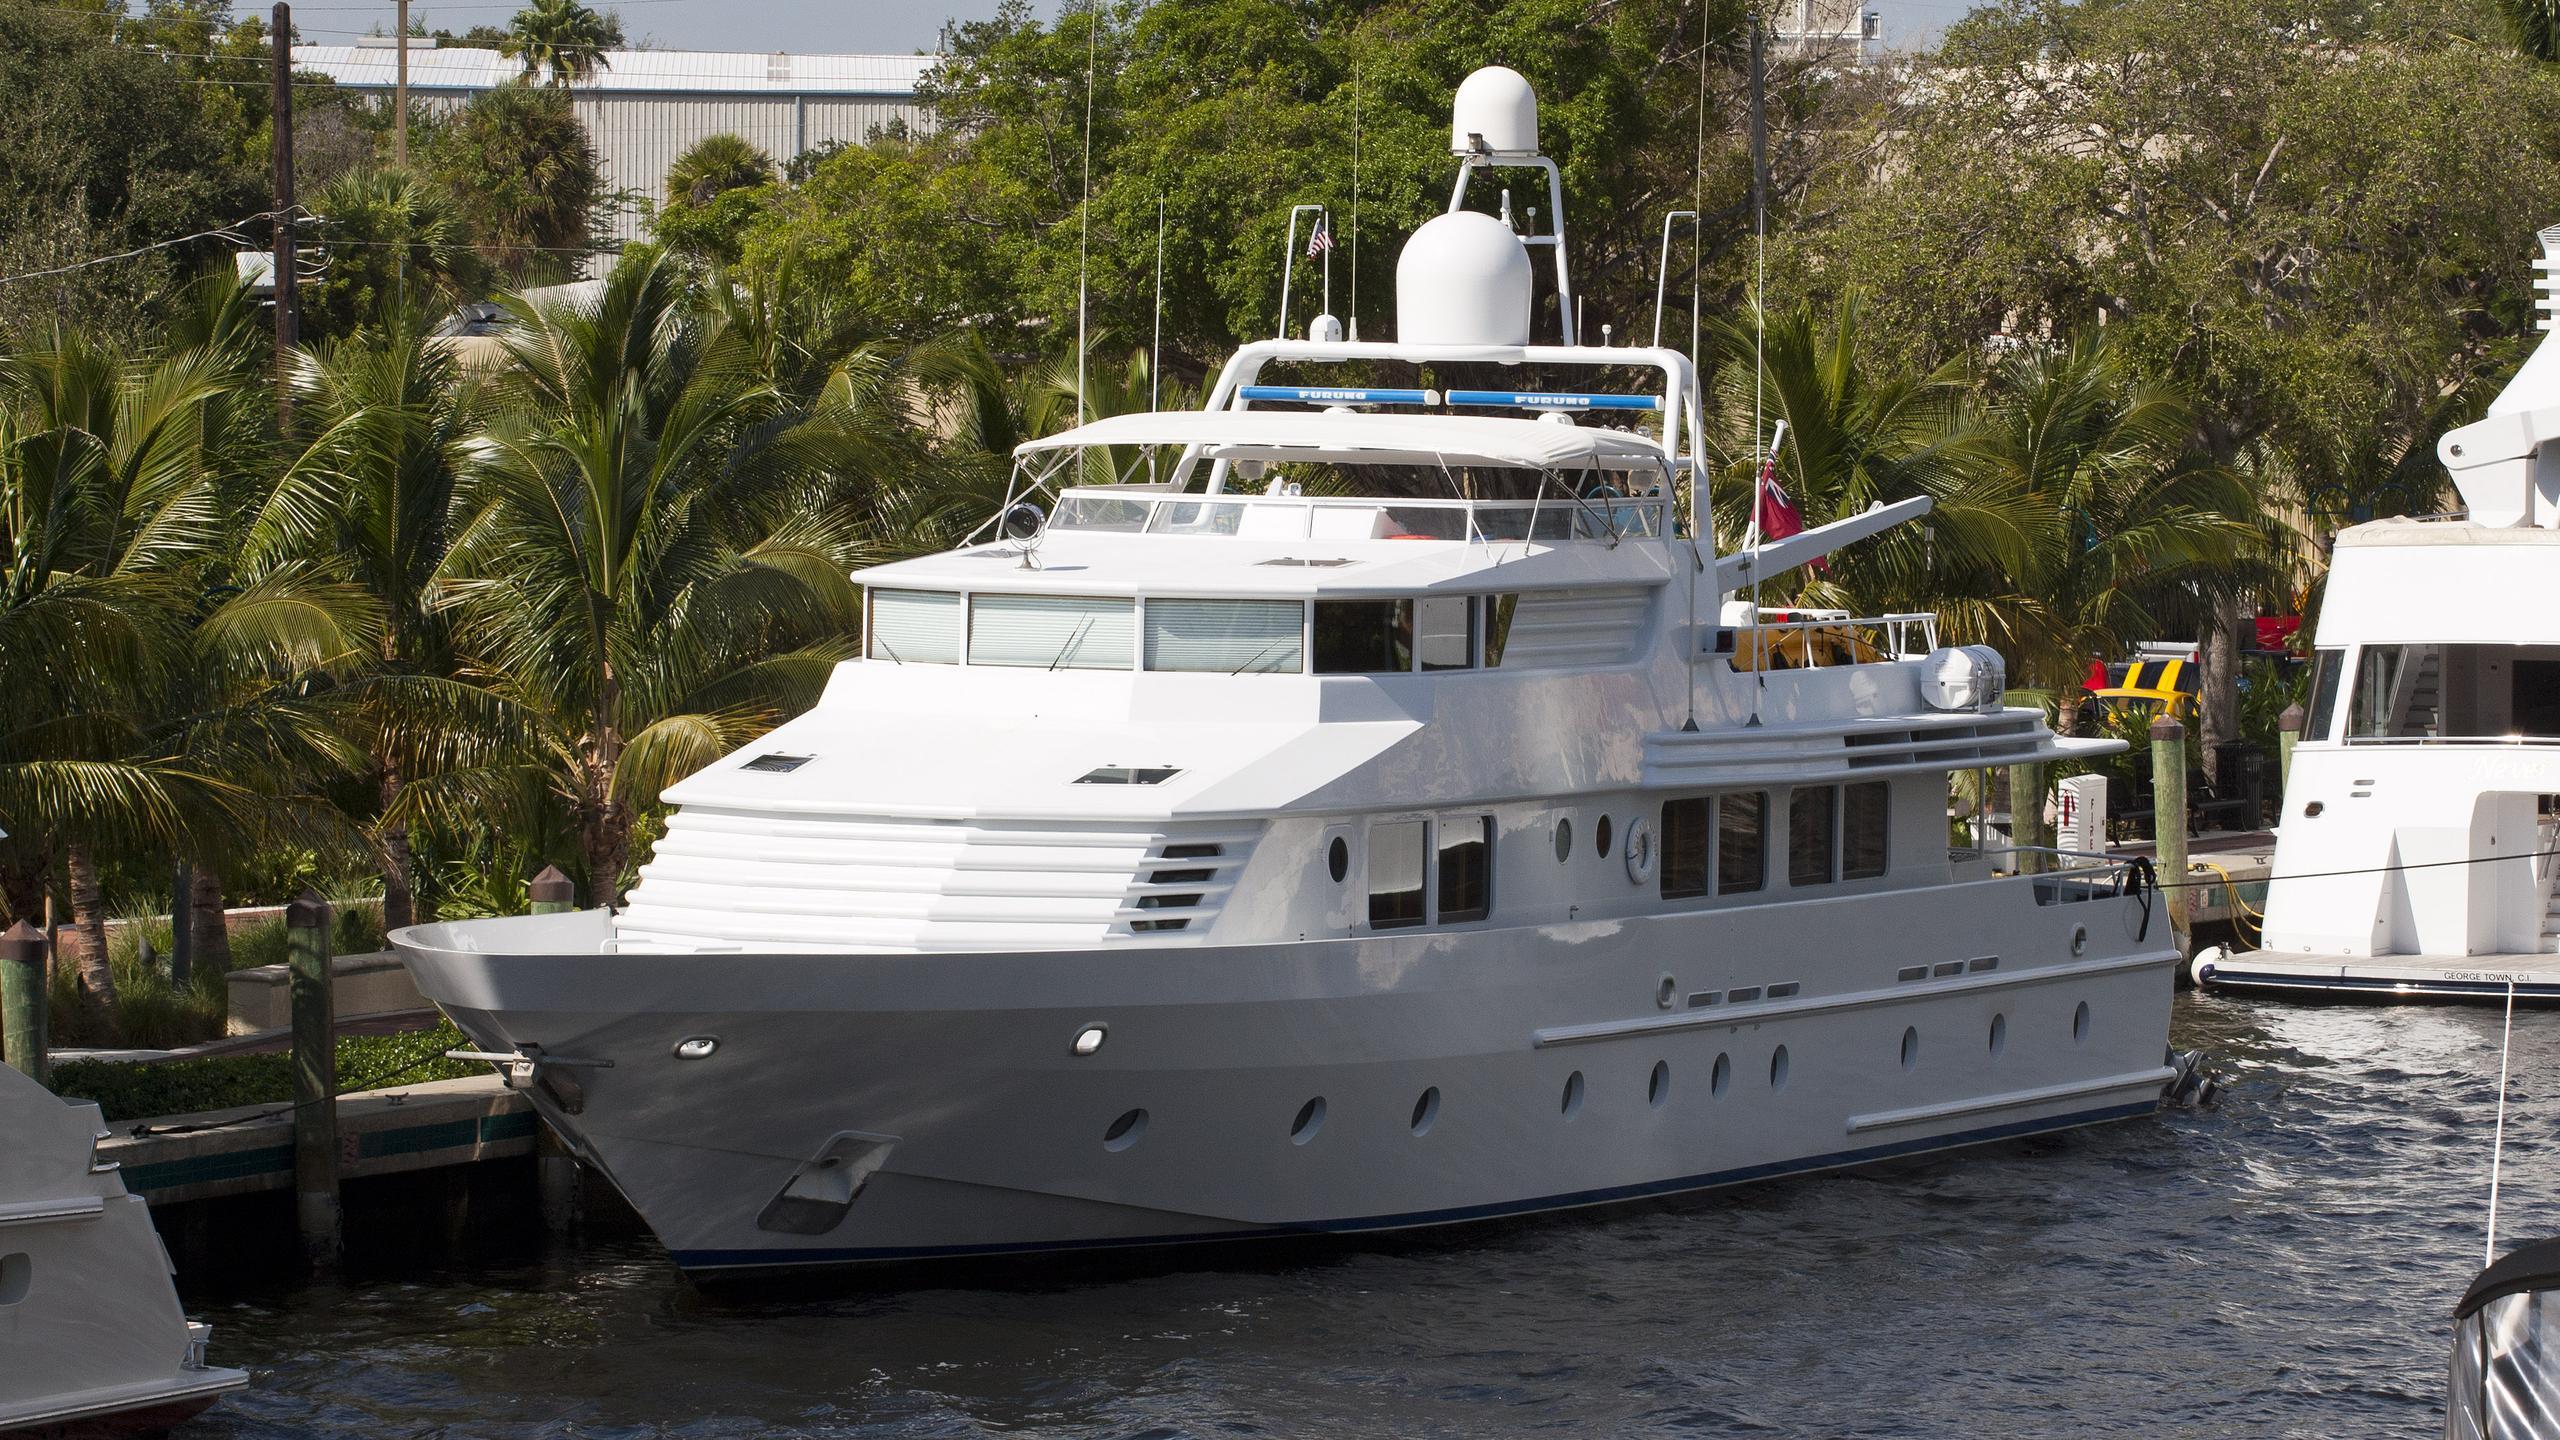 silent-wings-motor-yacht-derecktor-1991-31m-half-profile